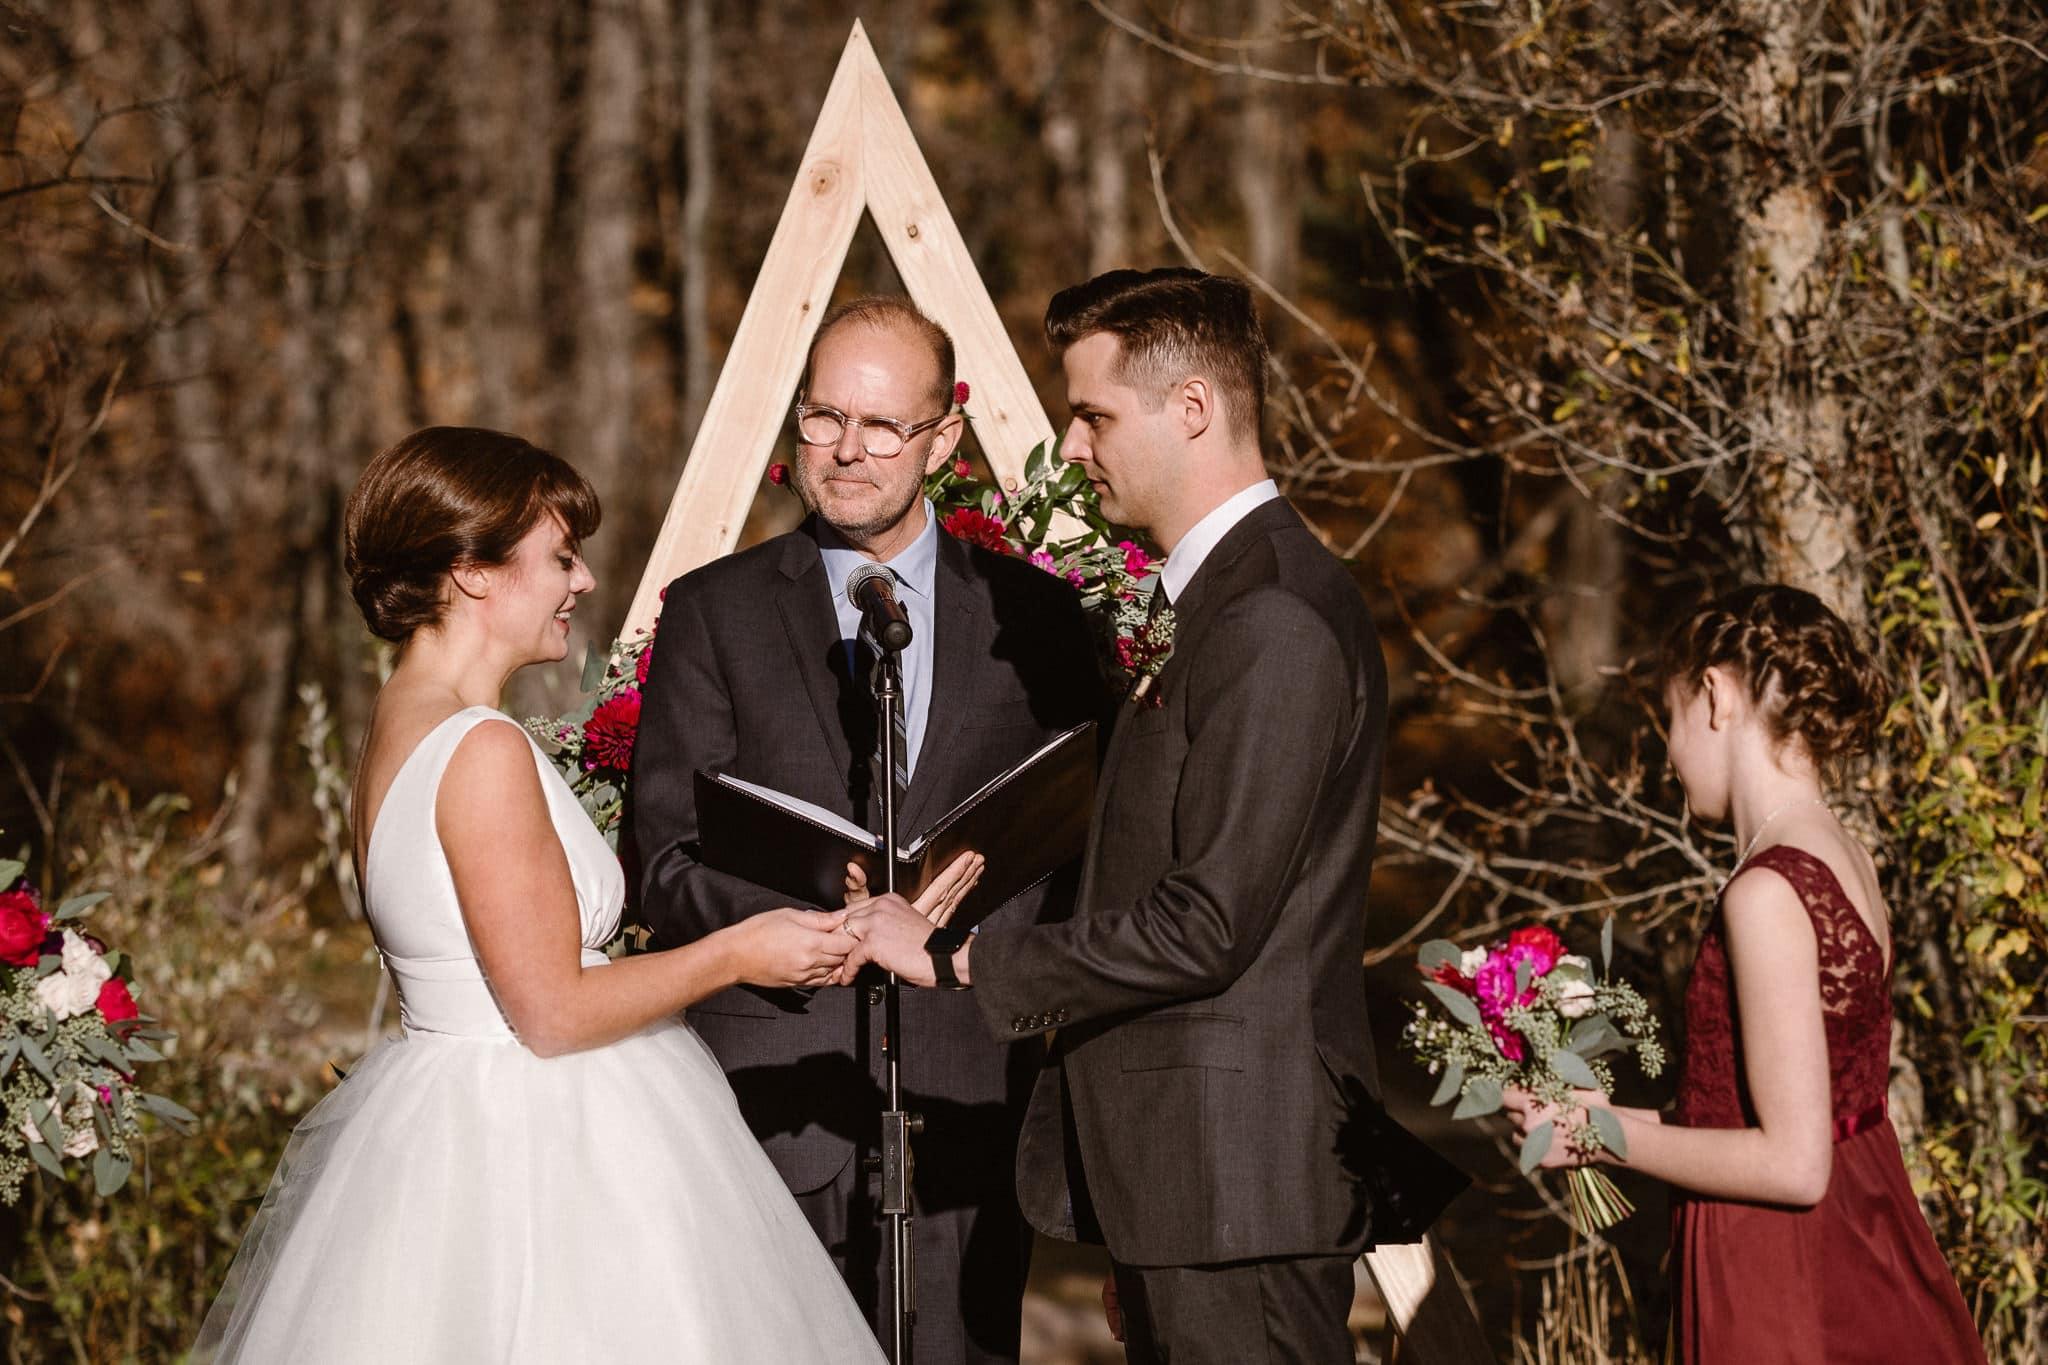 Silverthorne Pavilion wedding ceremony, Colorado wedding photographer, outdoor wedding ceremony, Colorado mountain wedding venues,